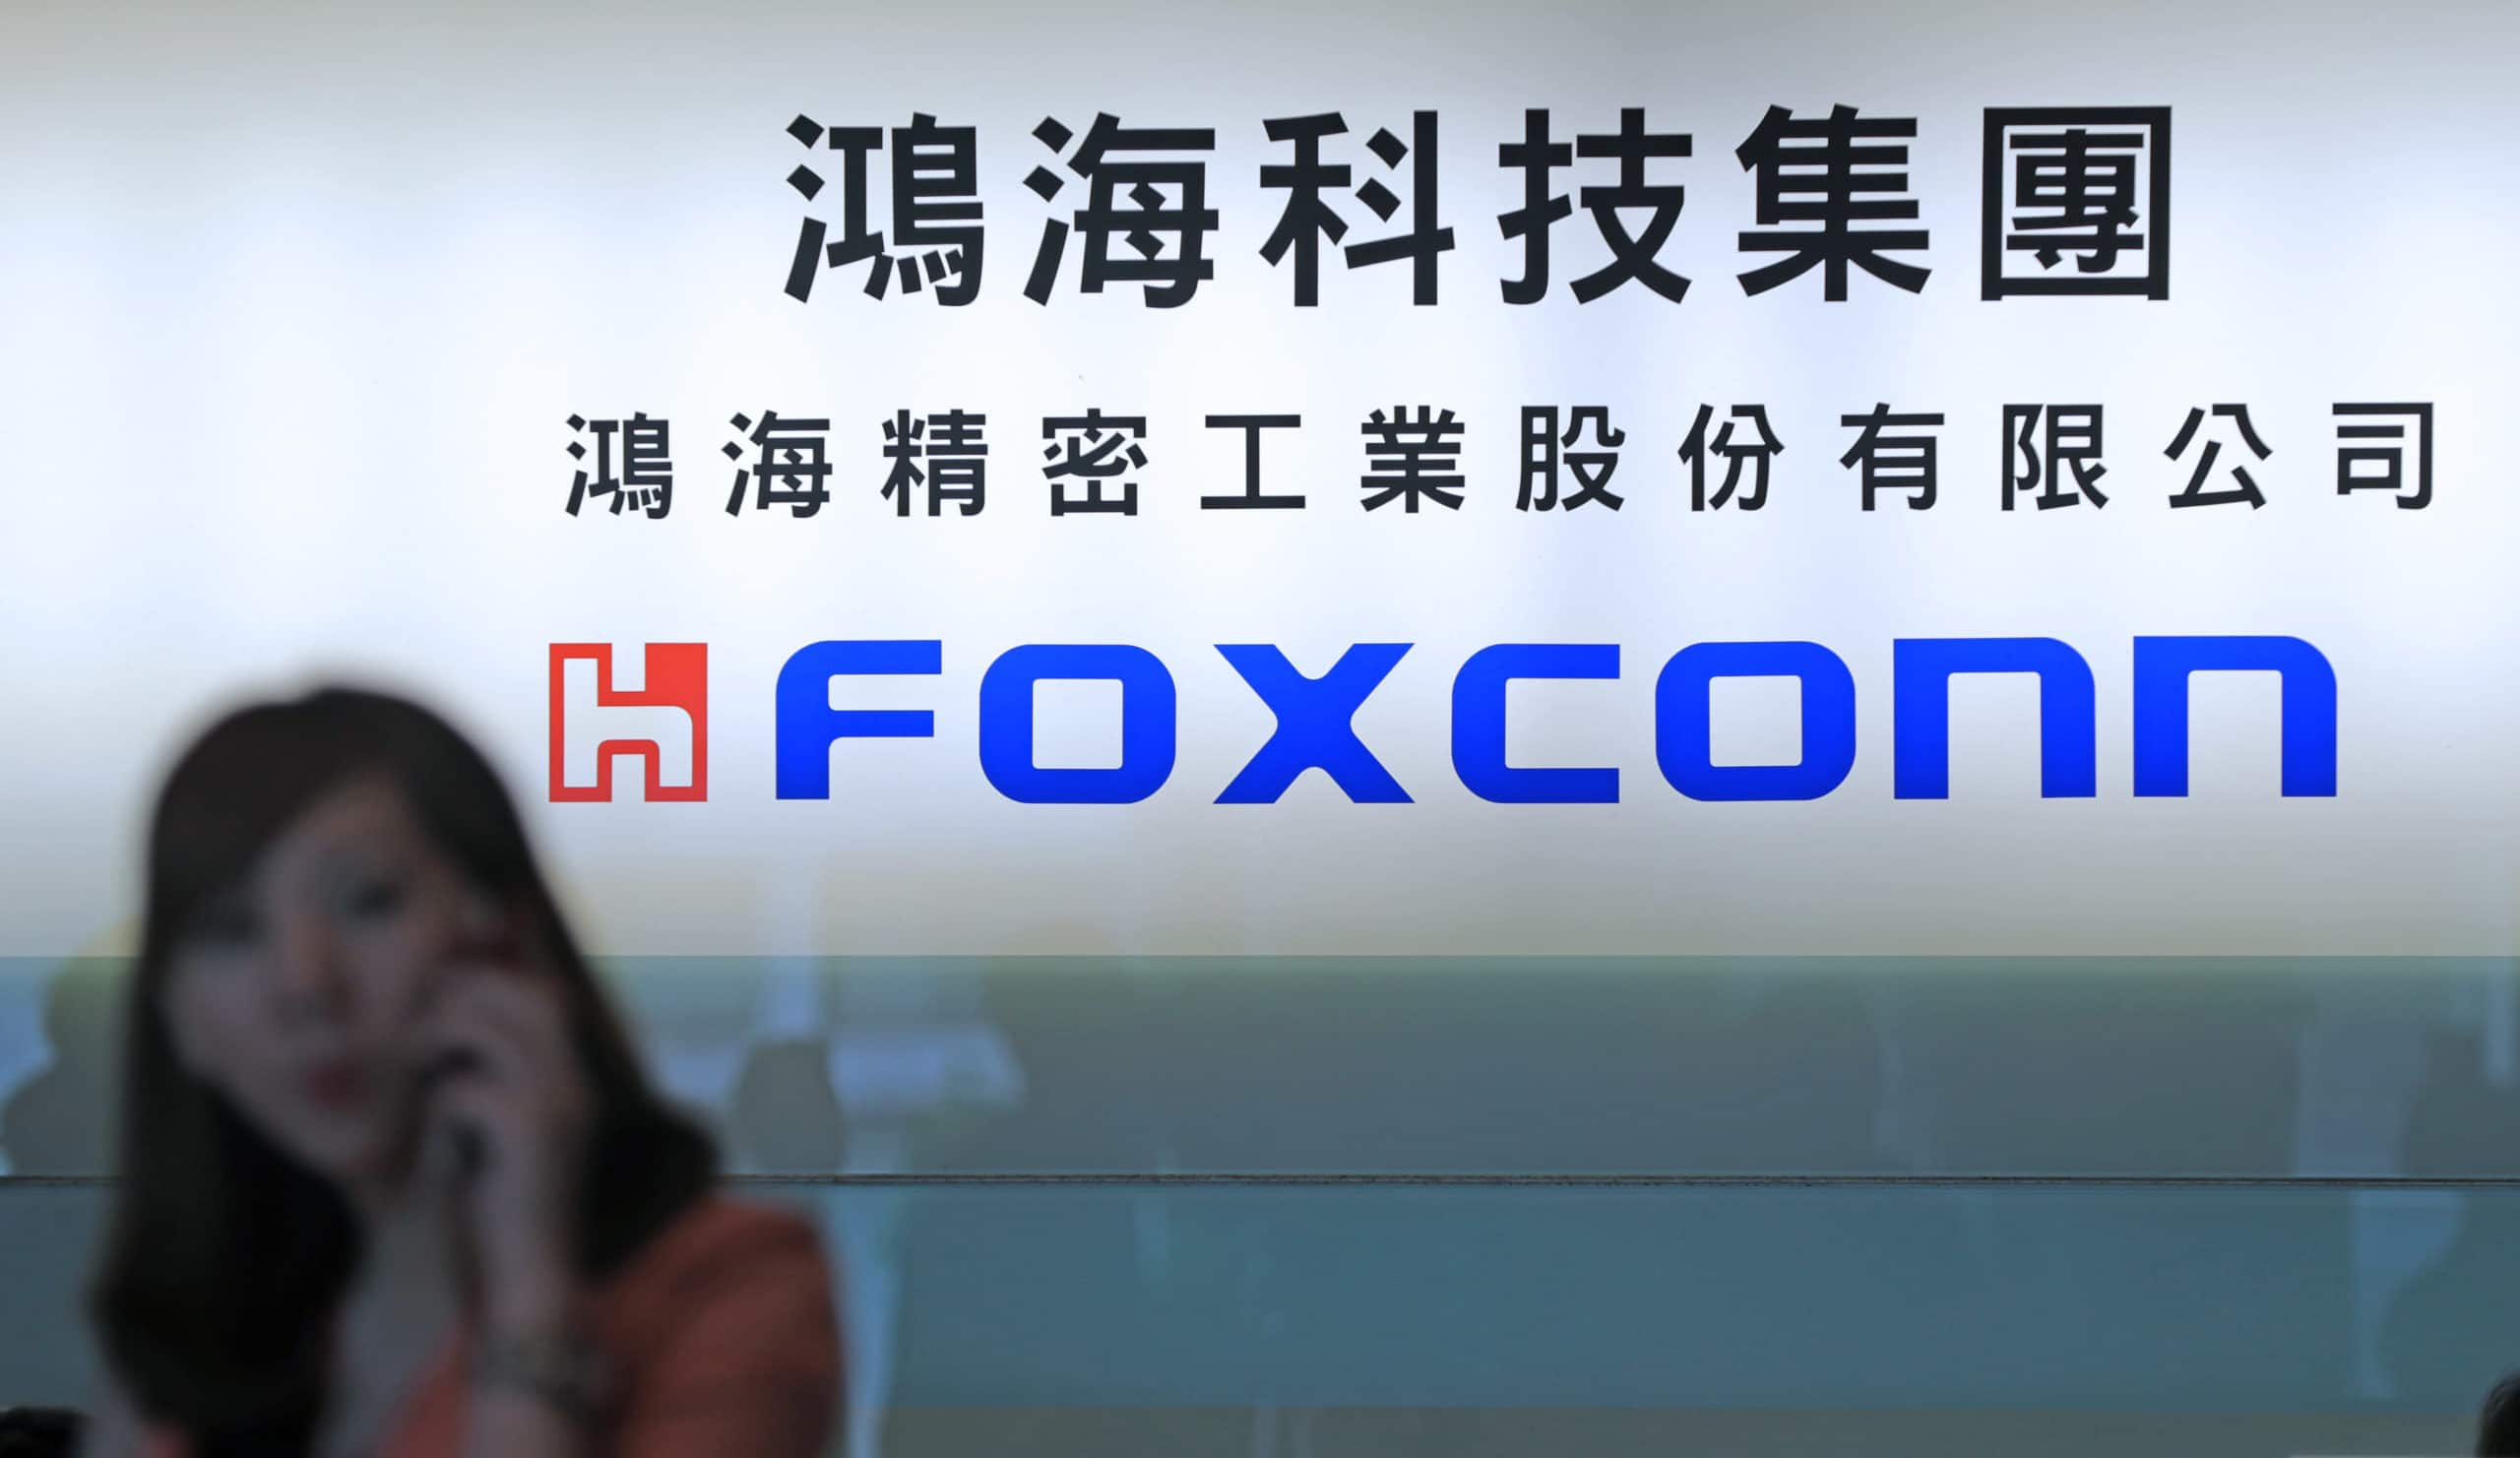 Logo da Foxconn